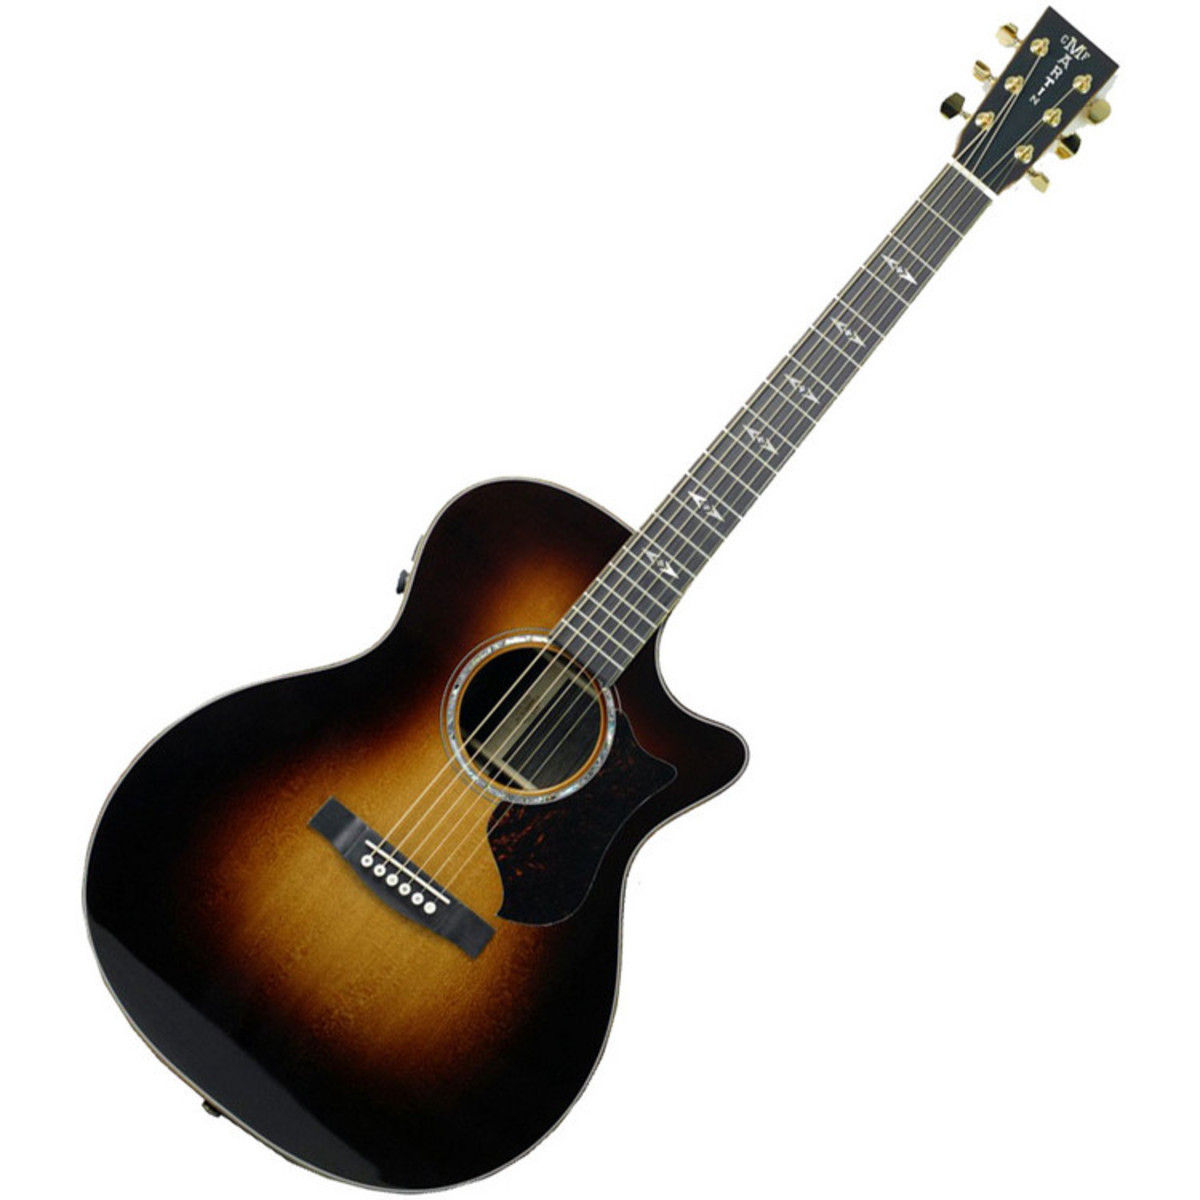 martin gpcpa1 plus guitare lectro acoustique sunburst. Black Bedroom Furniture Sets. Home Design Ideas